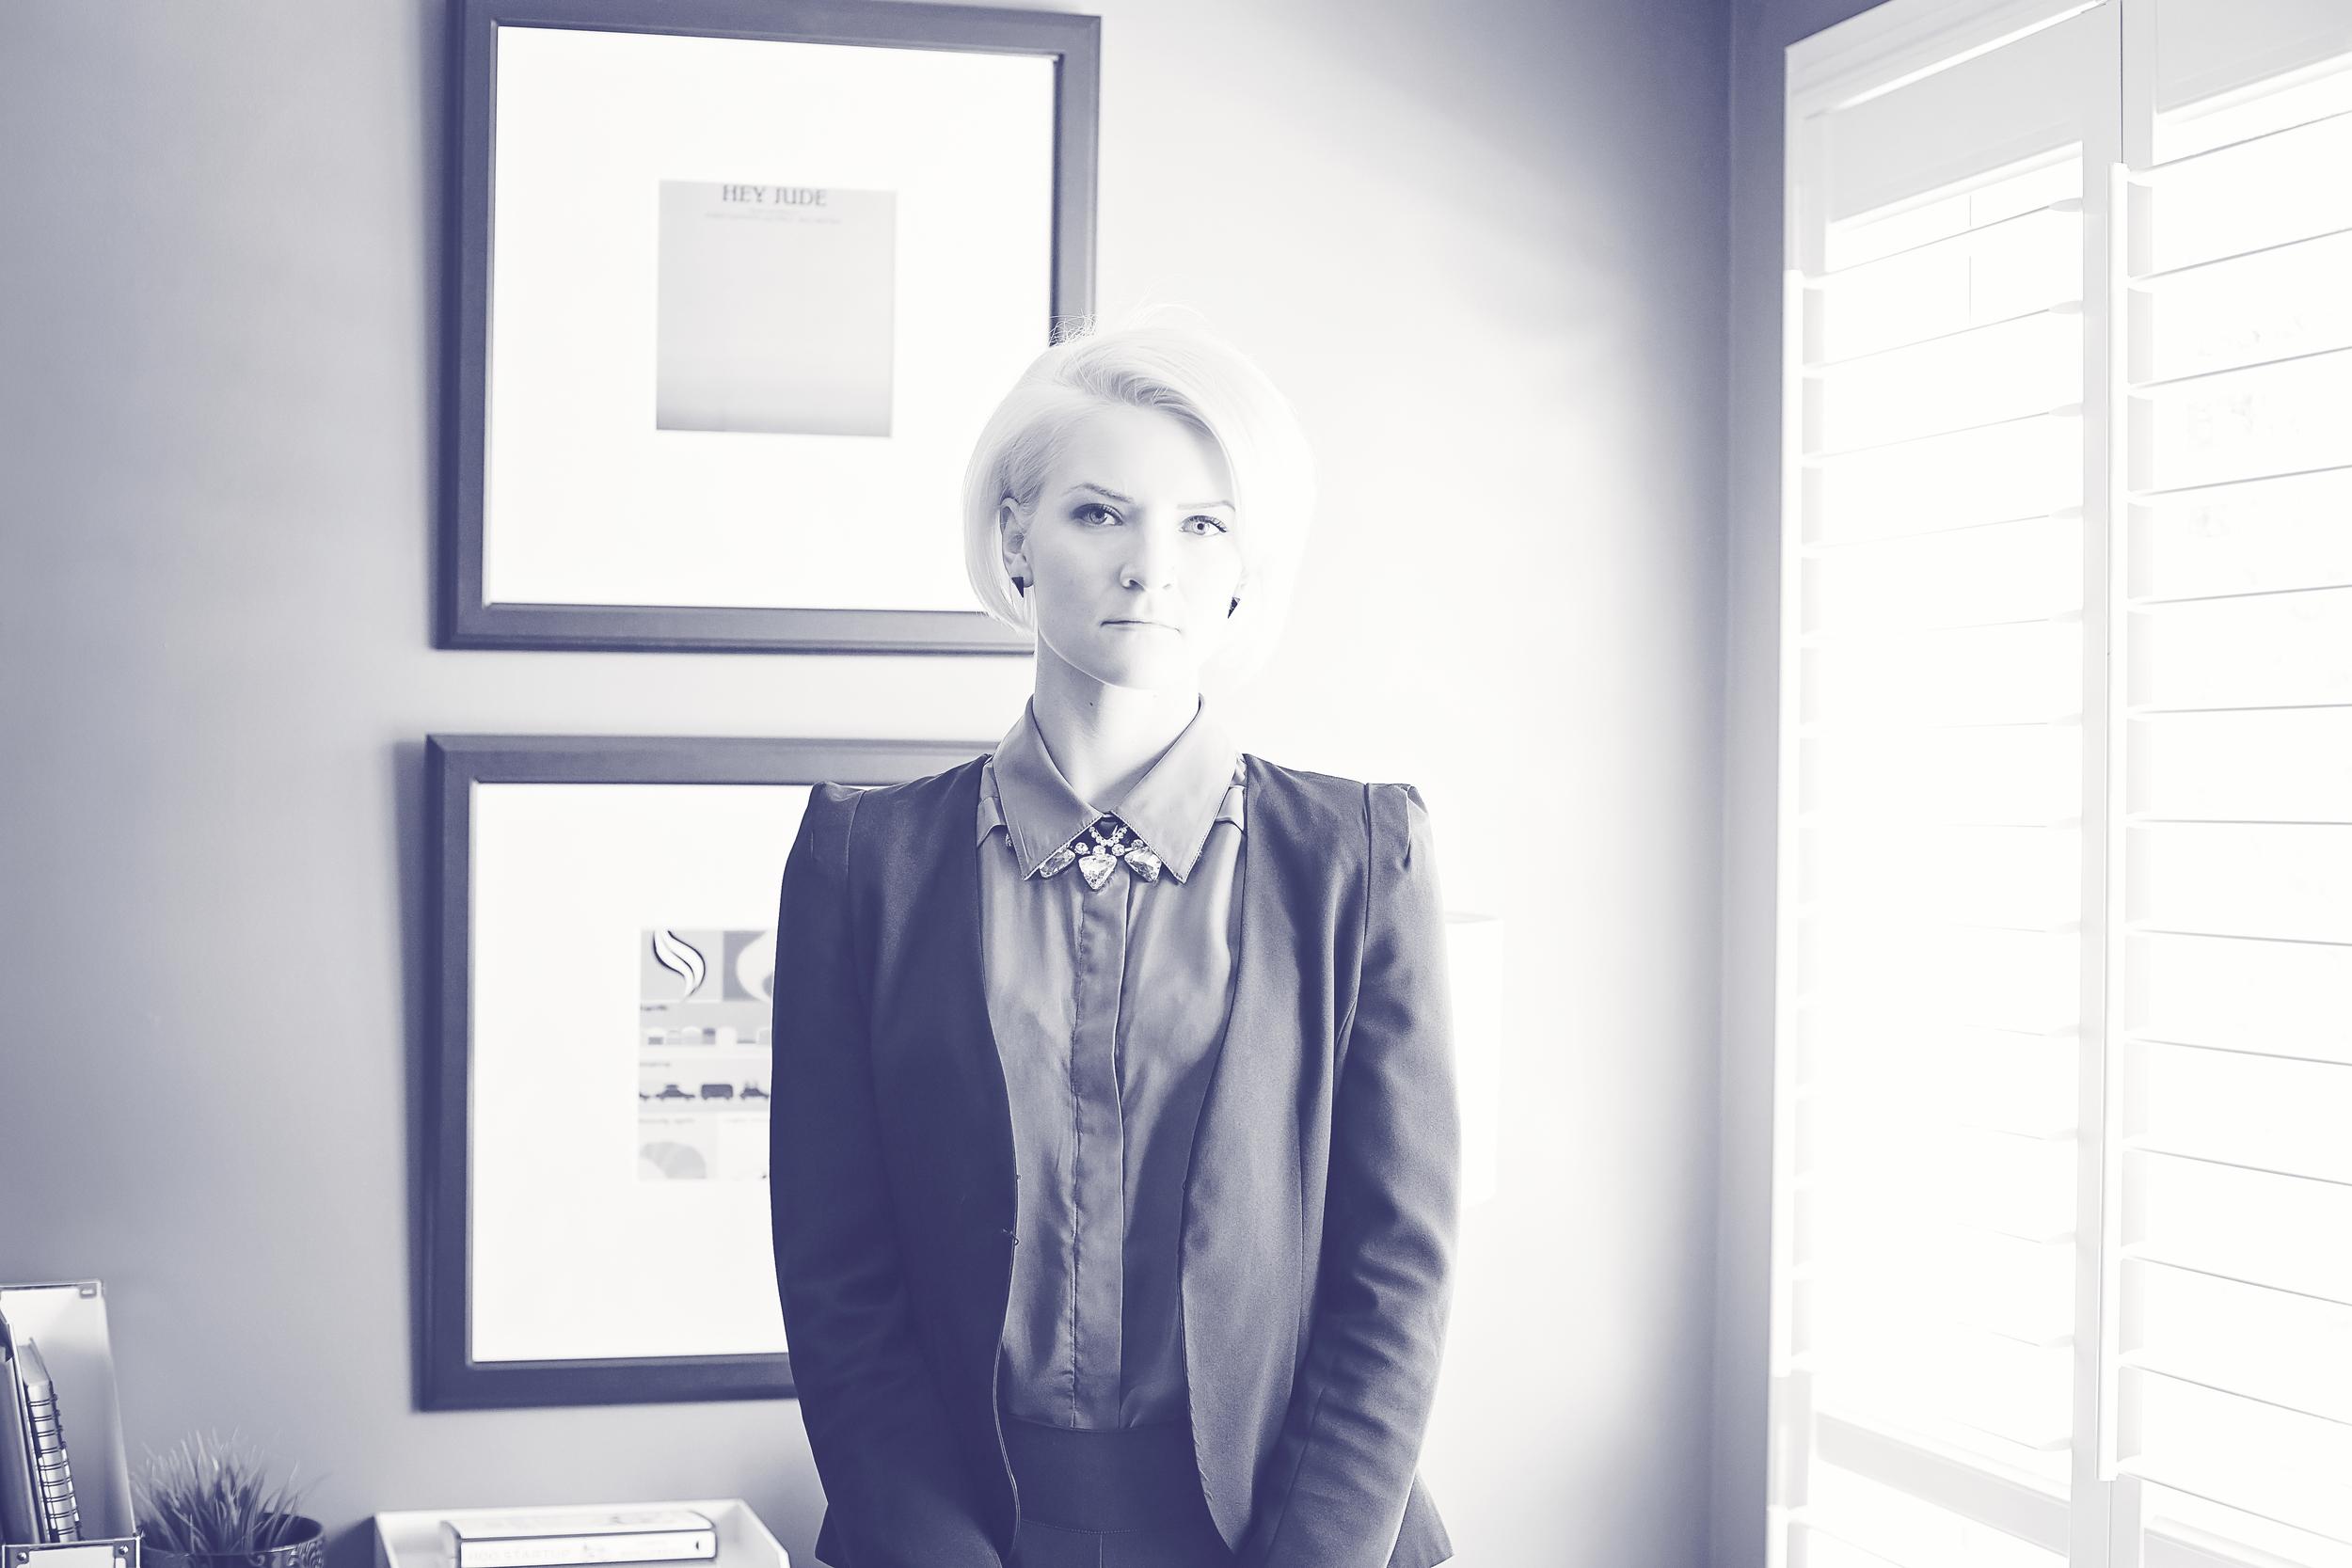 Credits: Photo - Bretton Dyte Photography, Styling - Sarah G. Schmidt, Location - Sarah G. Schmidt's home